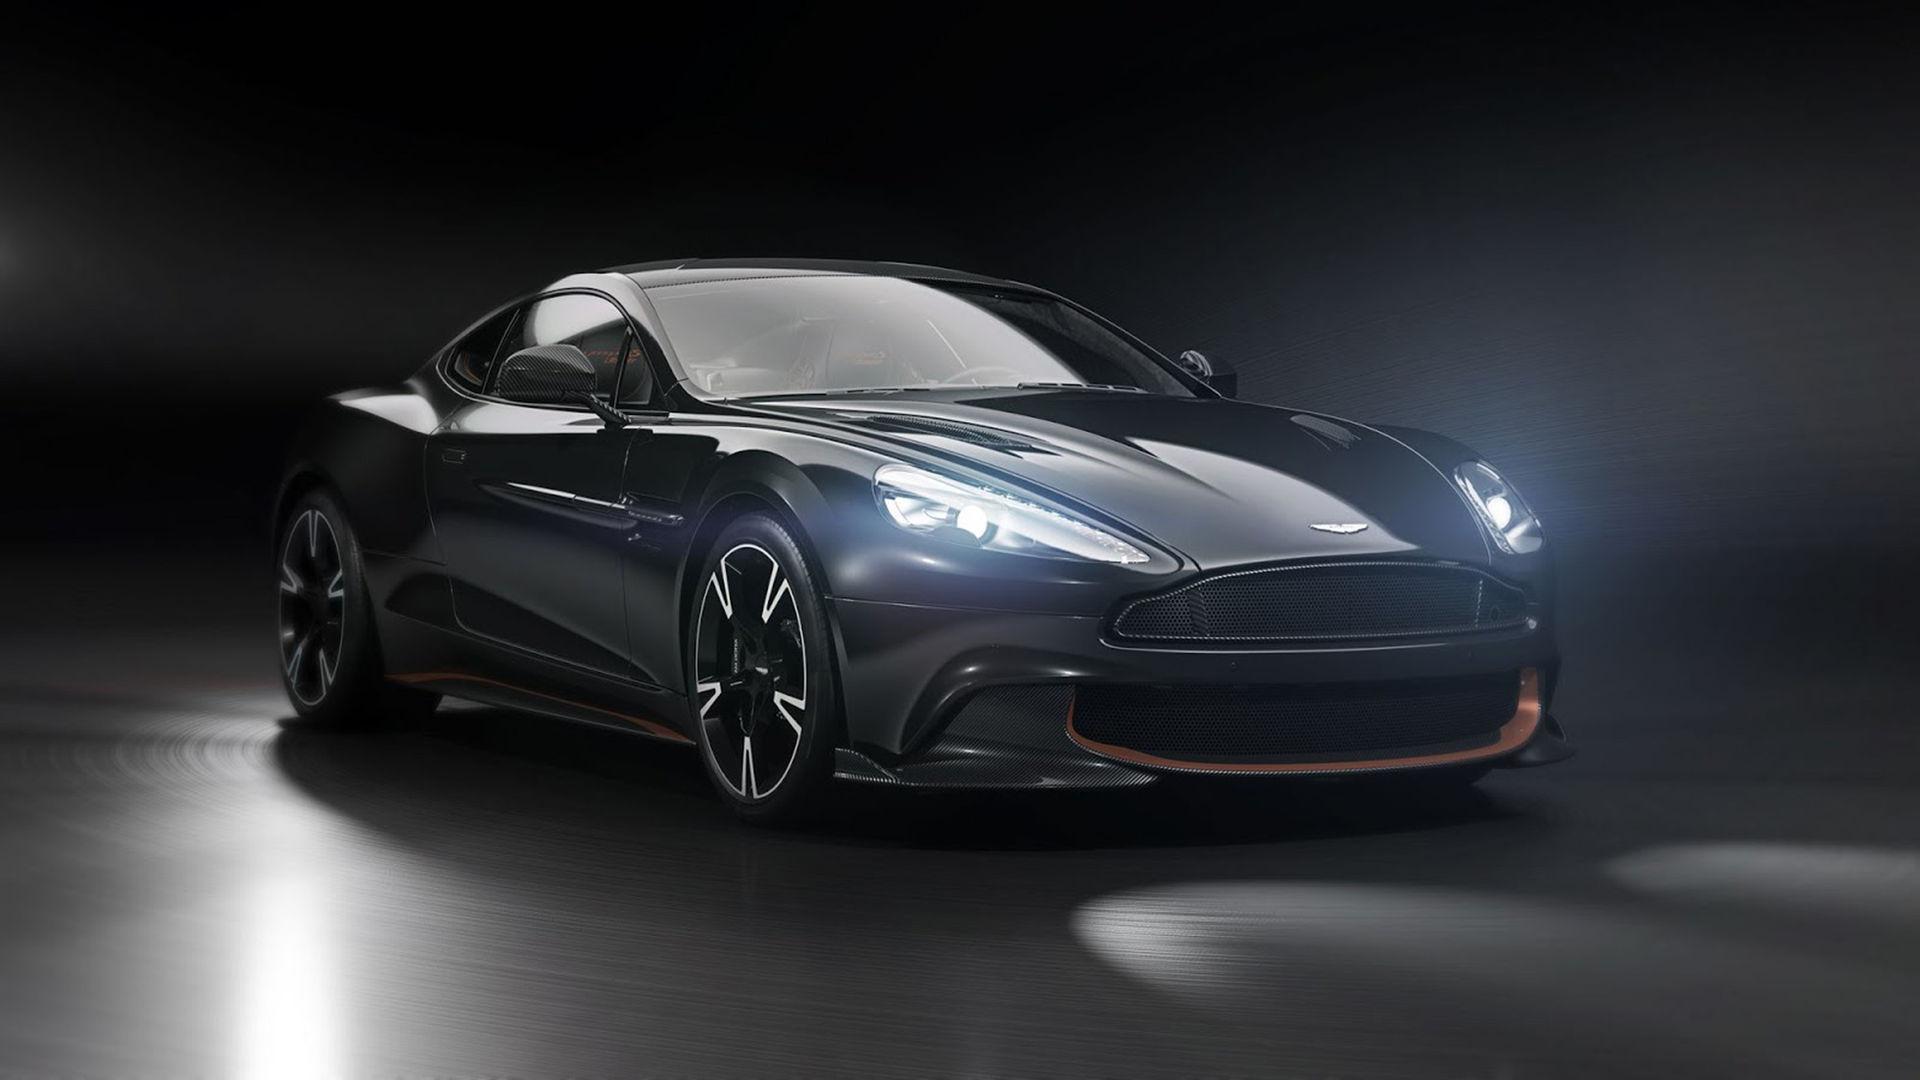 Aston Martin Vanquish S Ultimate vinkar av modellen